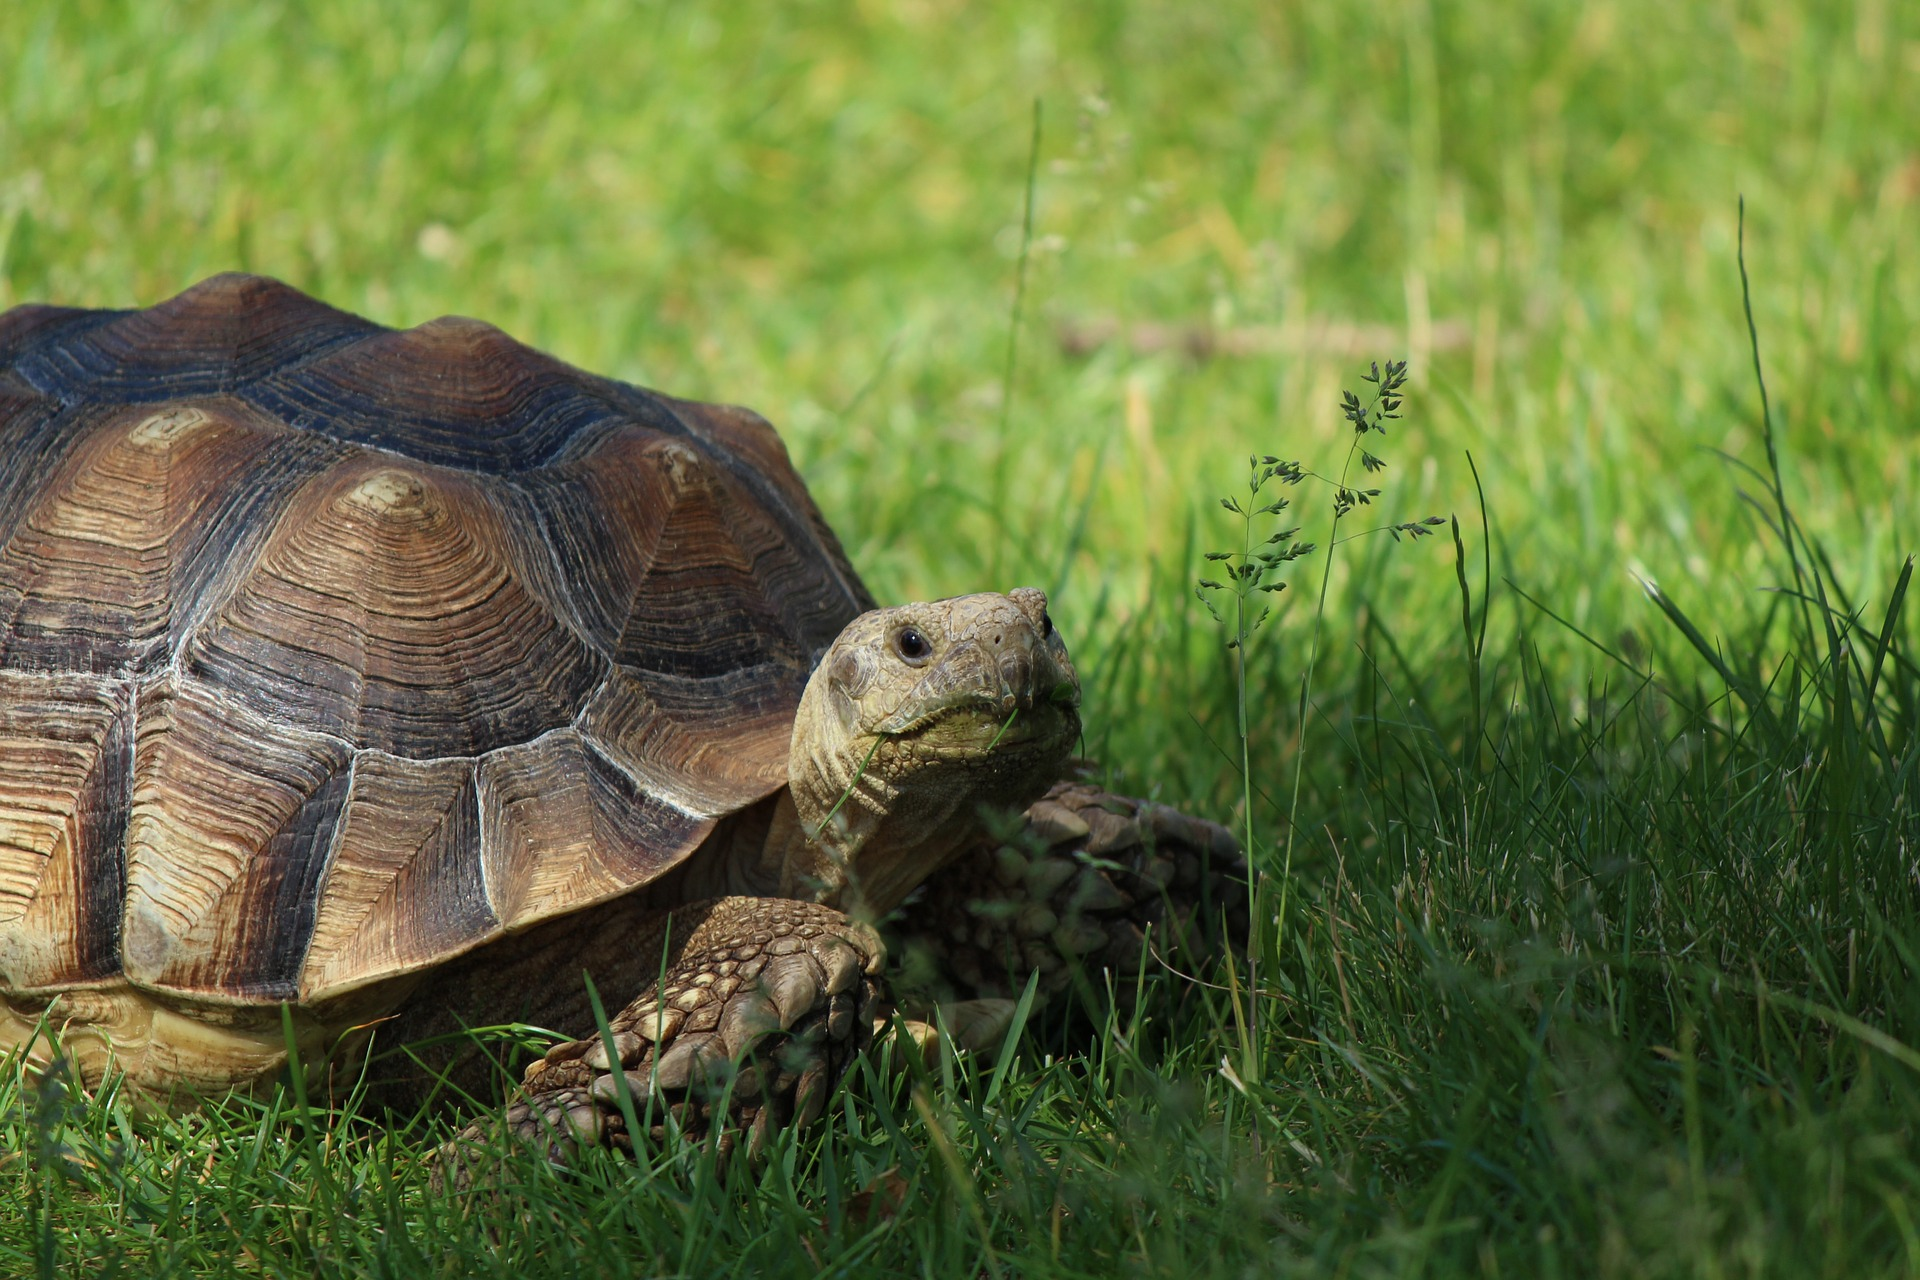 Old tortoise photo